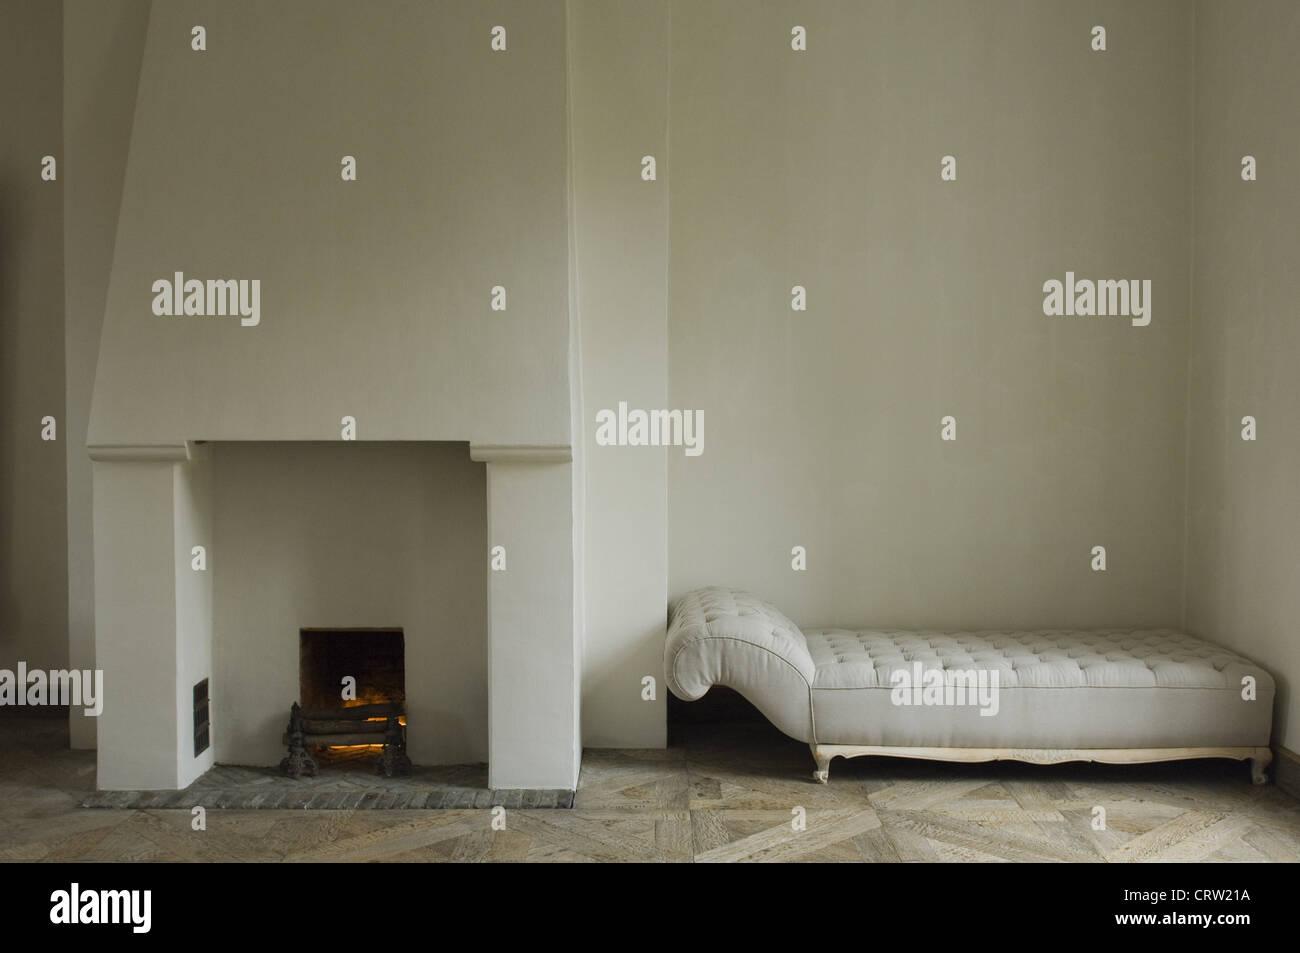 Chimenea y sofá Imagen De Stock